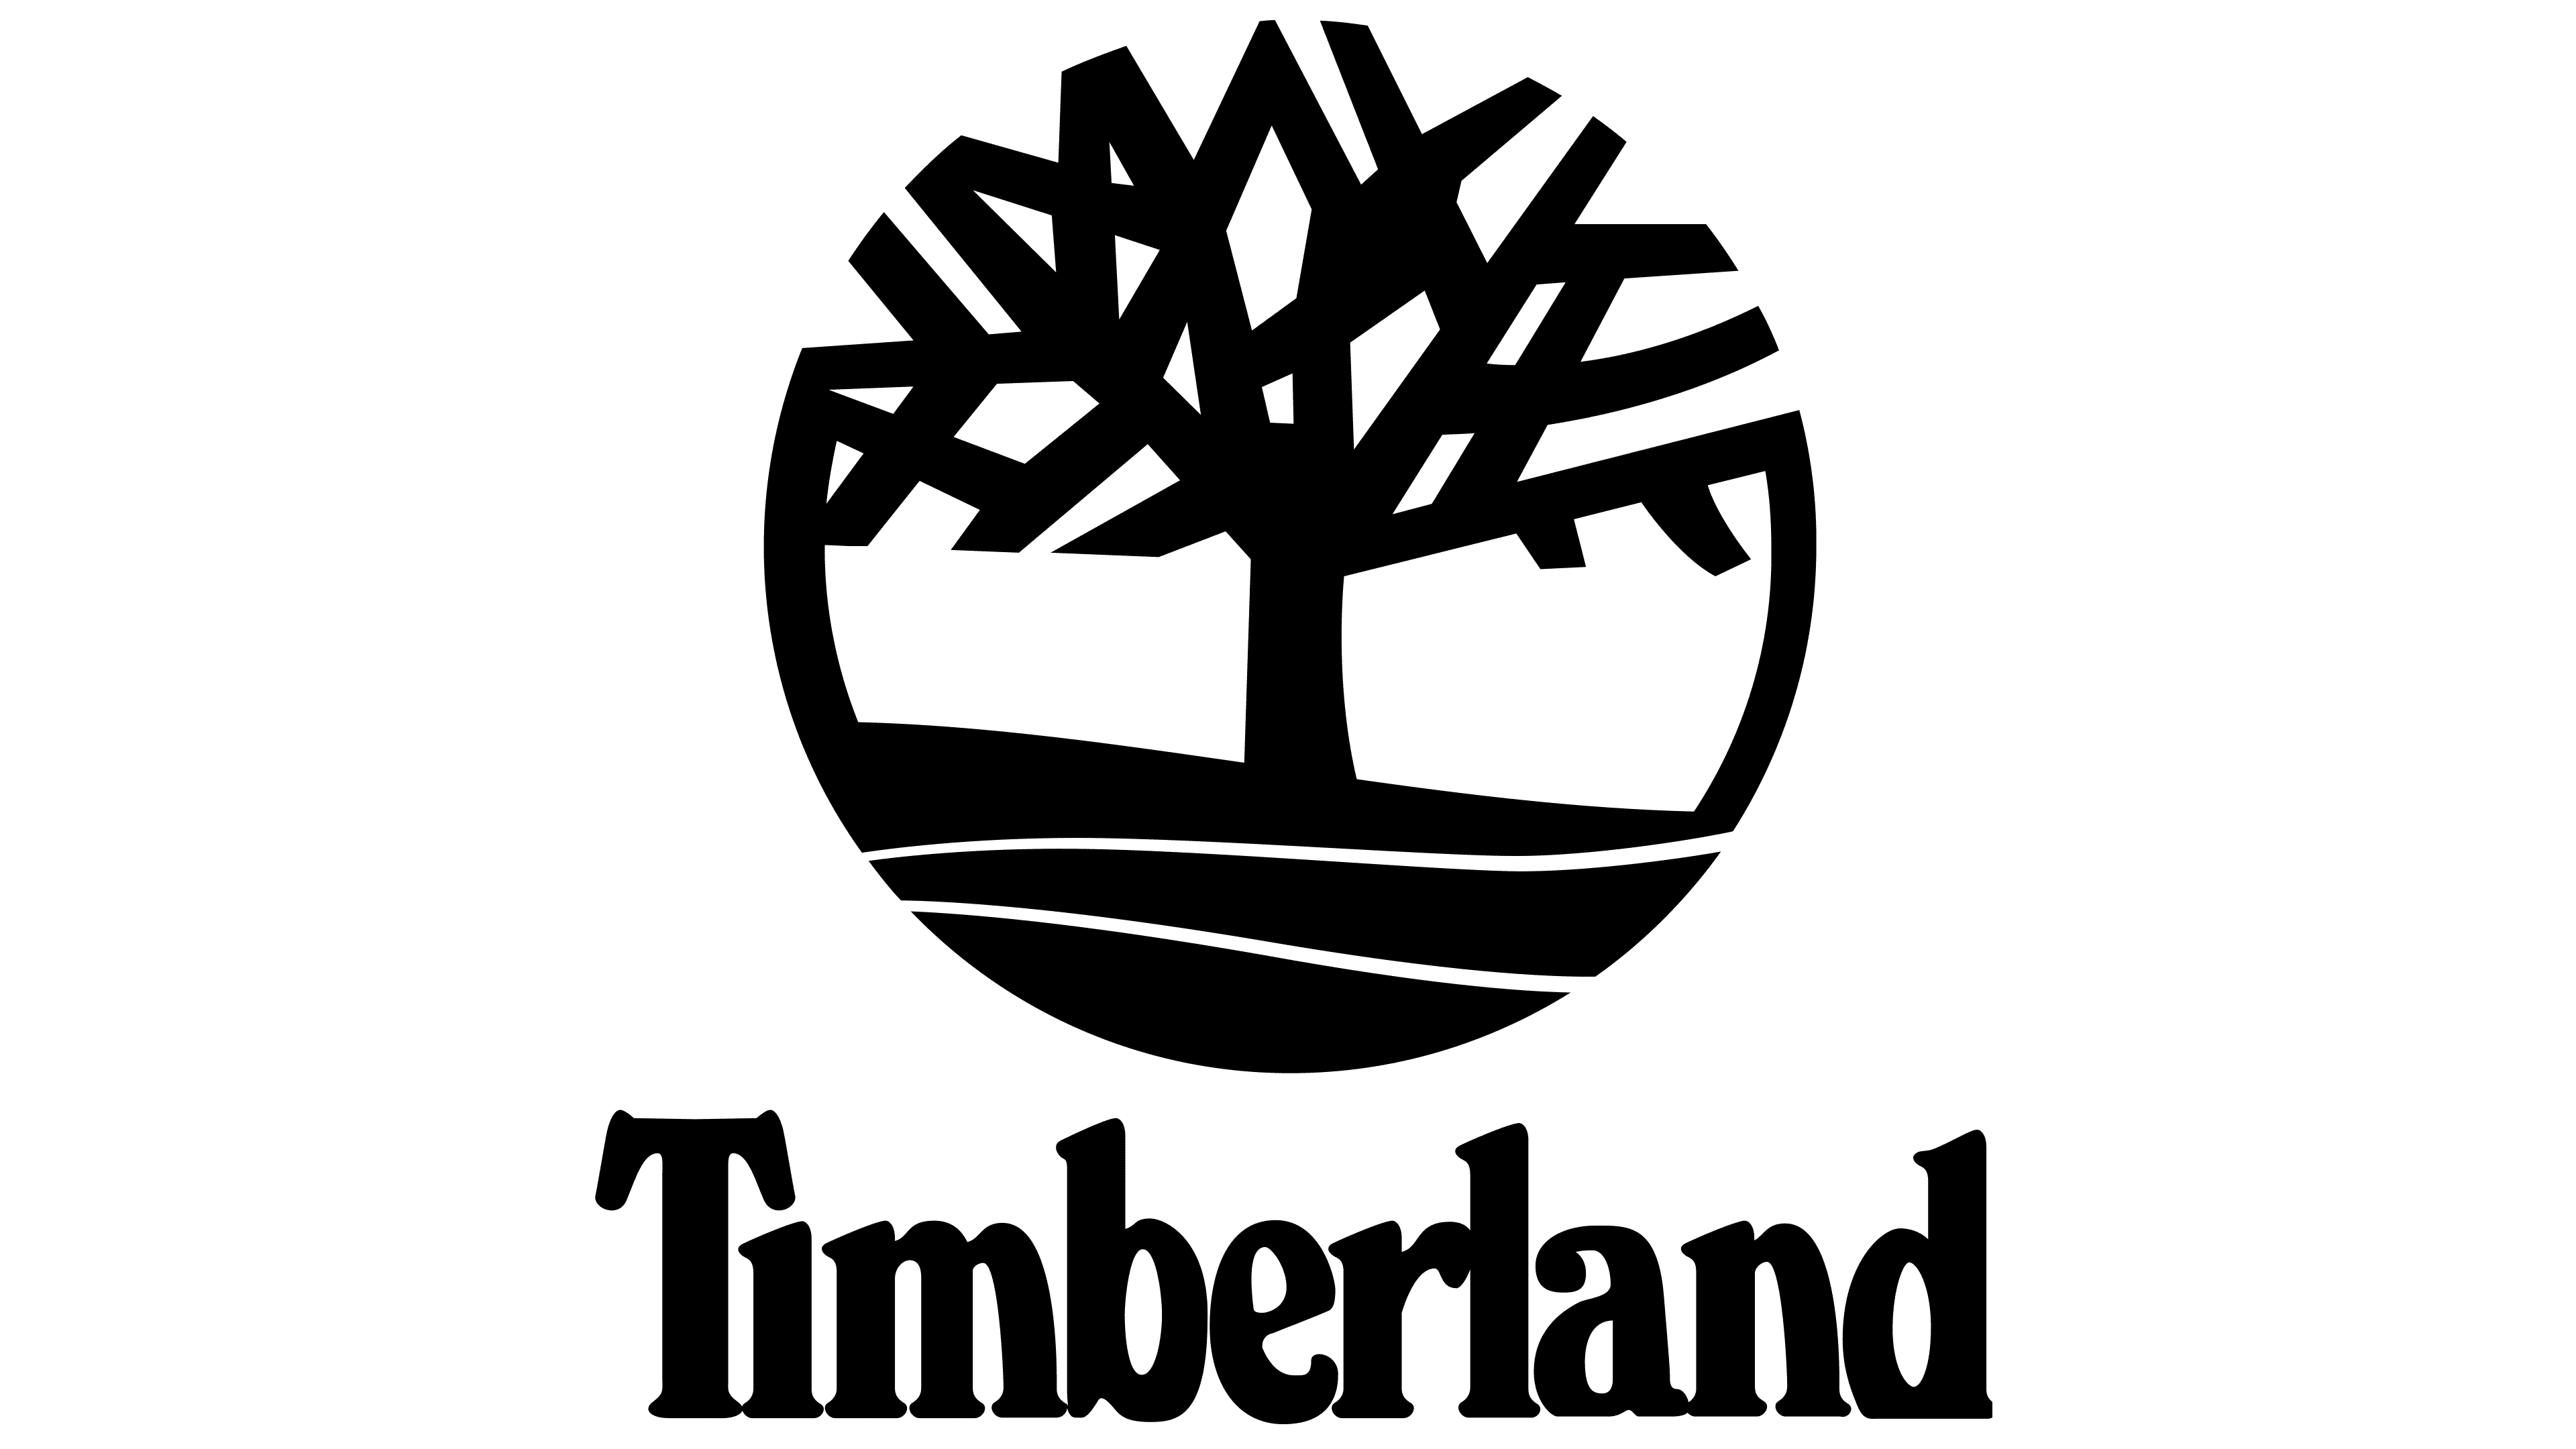 https://mysunrays.com/wp-content/uploads/2021/09/Timberland-Logo.png